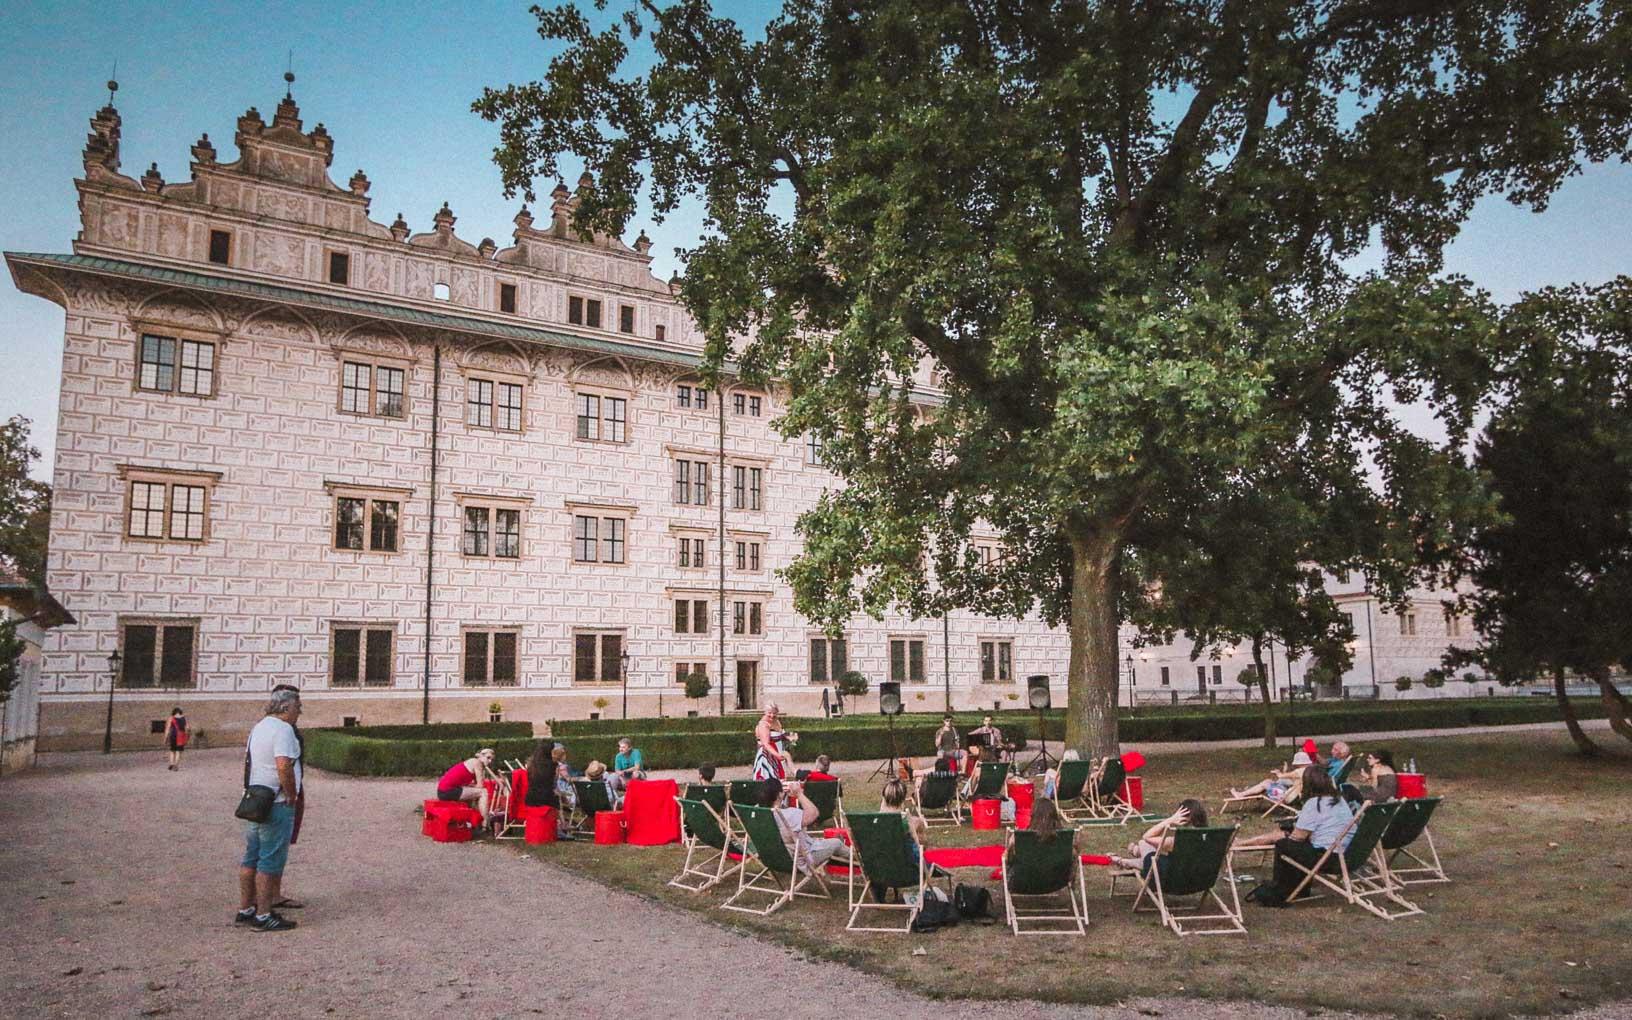 Litomysl castle garden - Visit Litomysl in Czech Republic